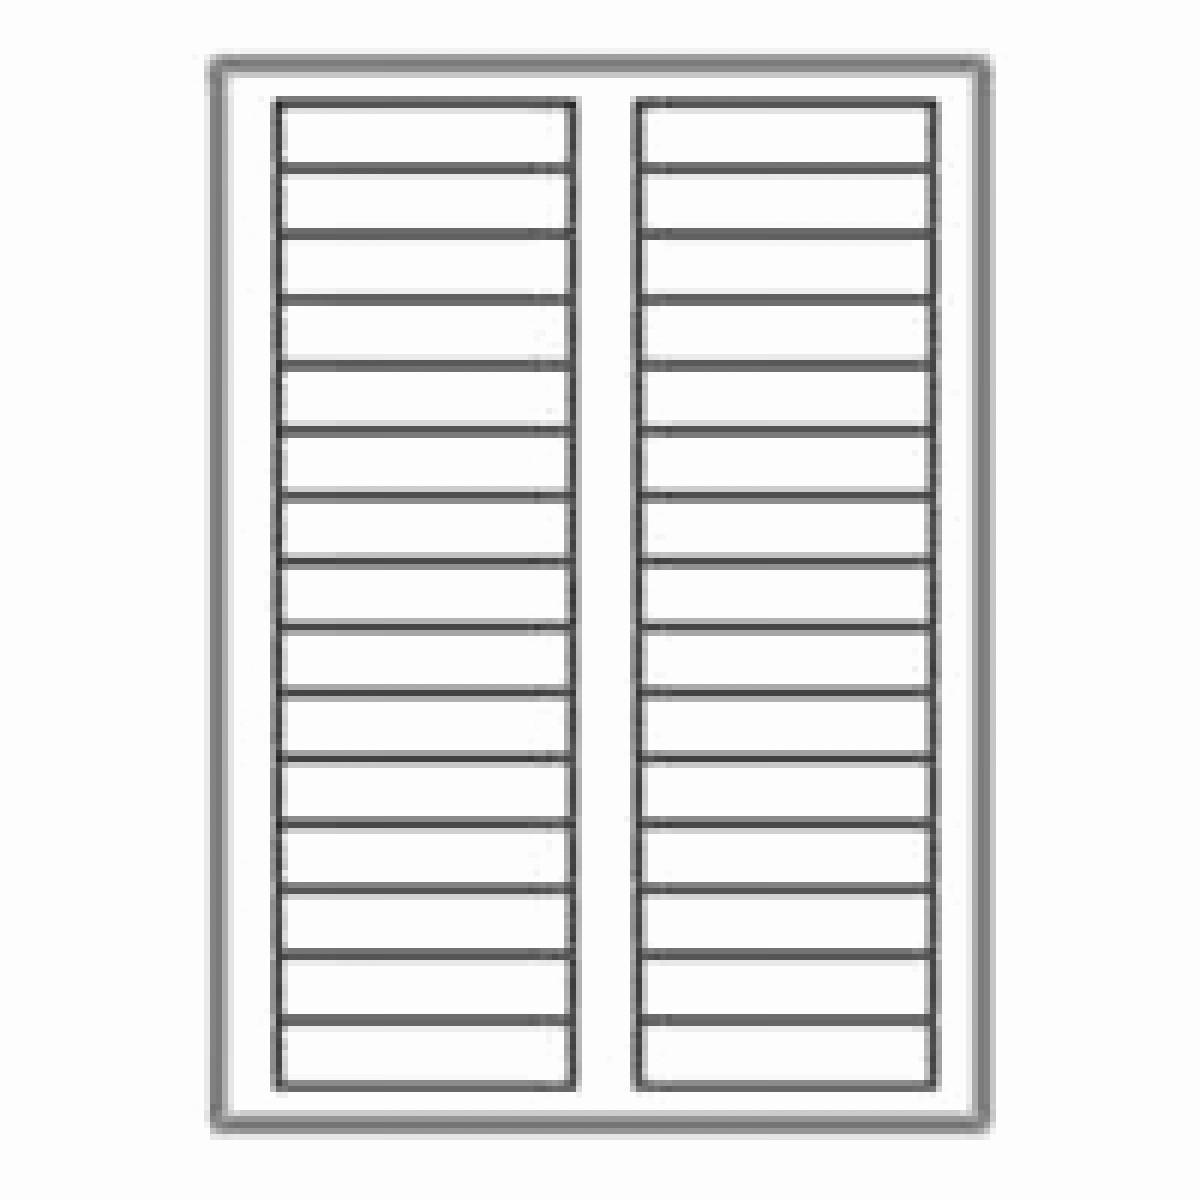 "Mailing Labels 30 Per Sheet Fresh 3000 Neato Filing Labels 30 Per Sheet 2 3"" X 3 7 16"